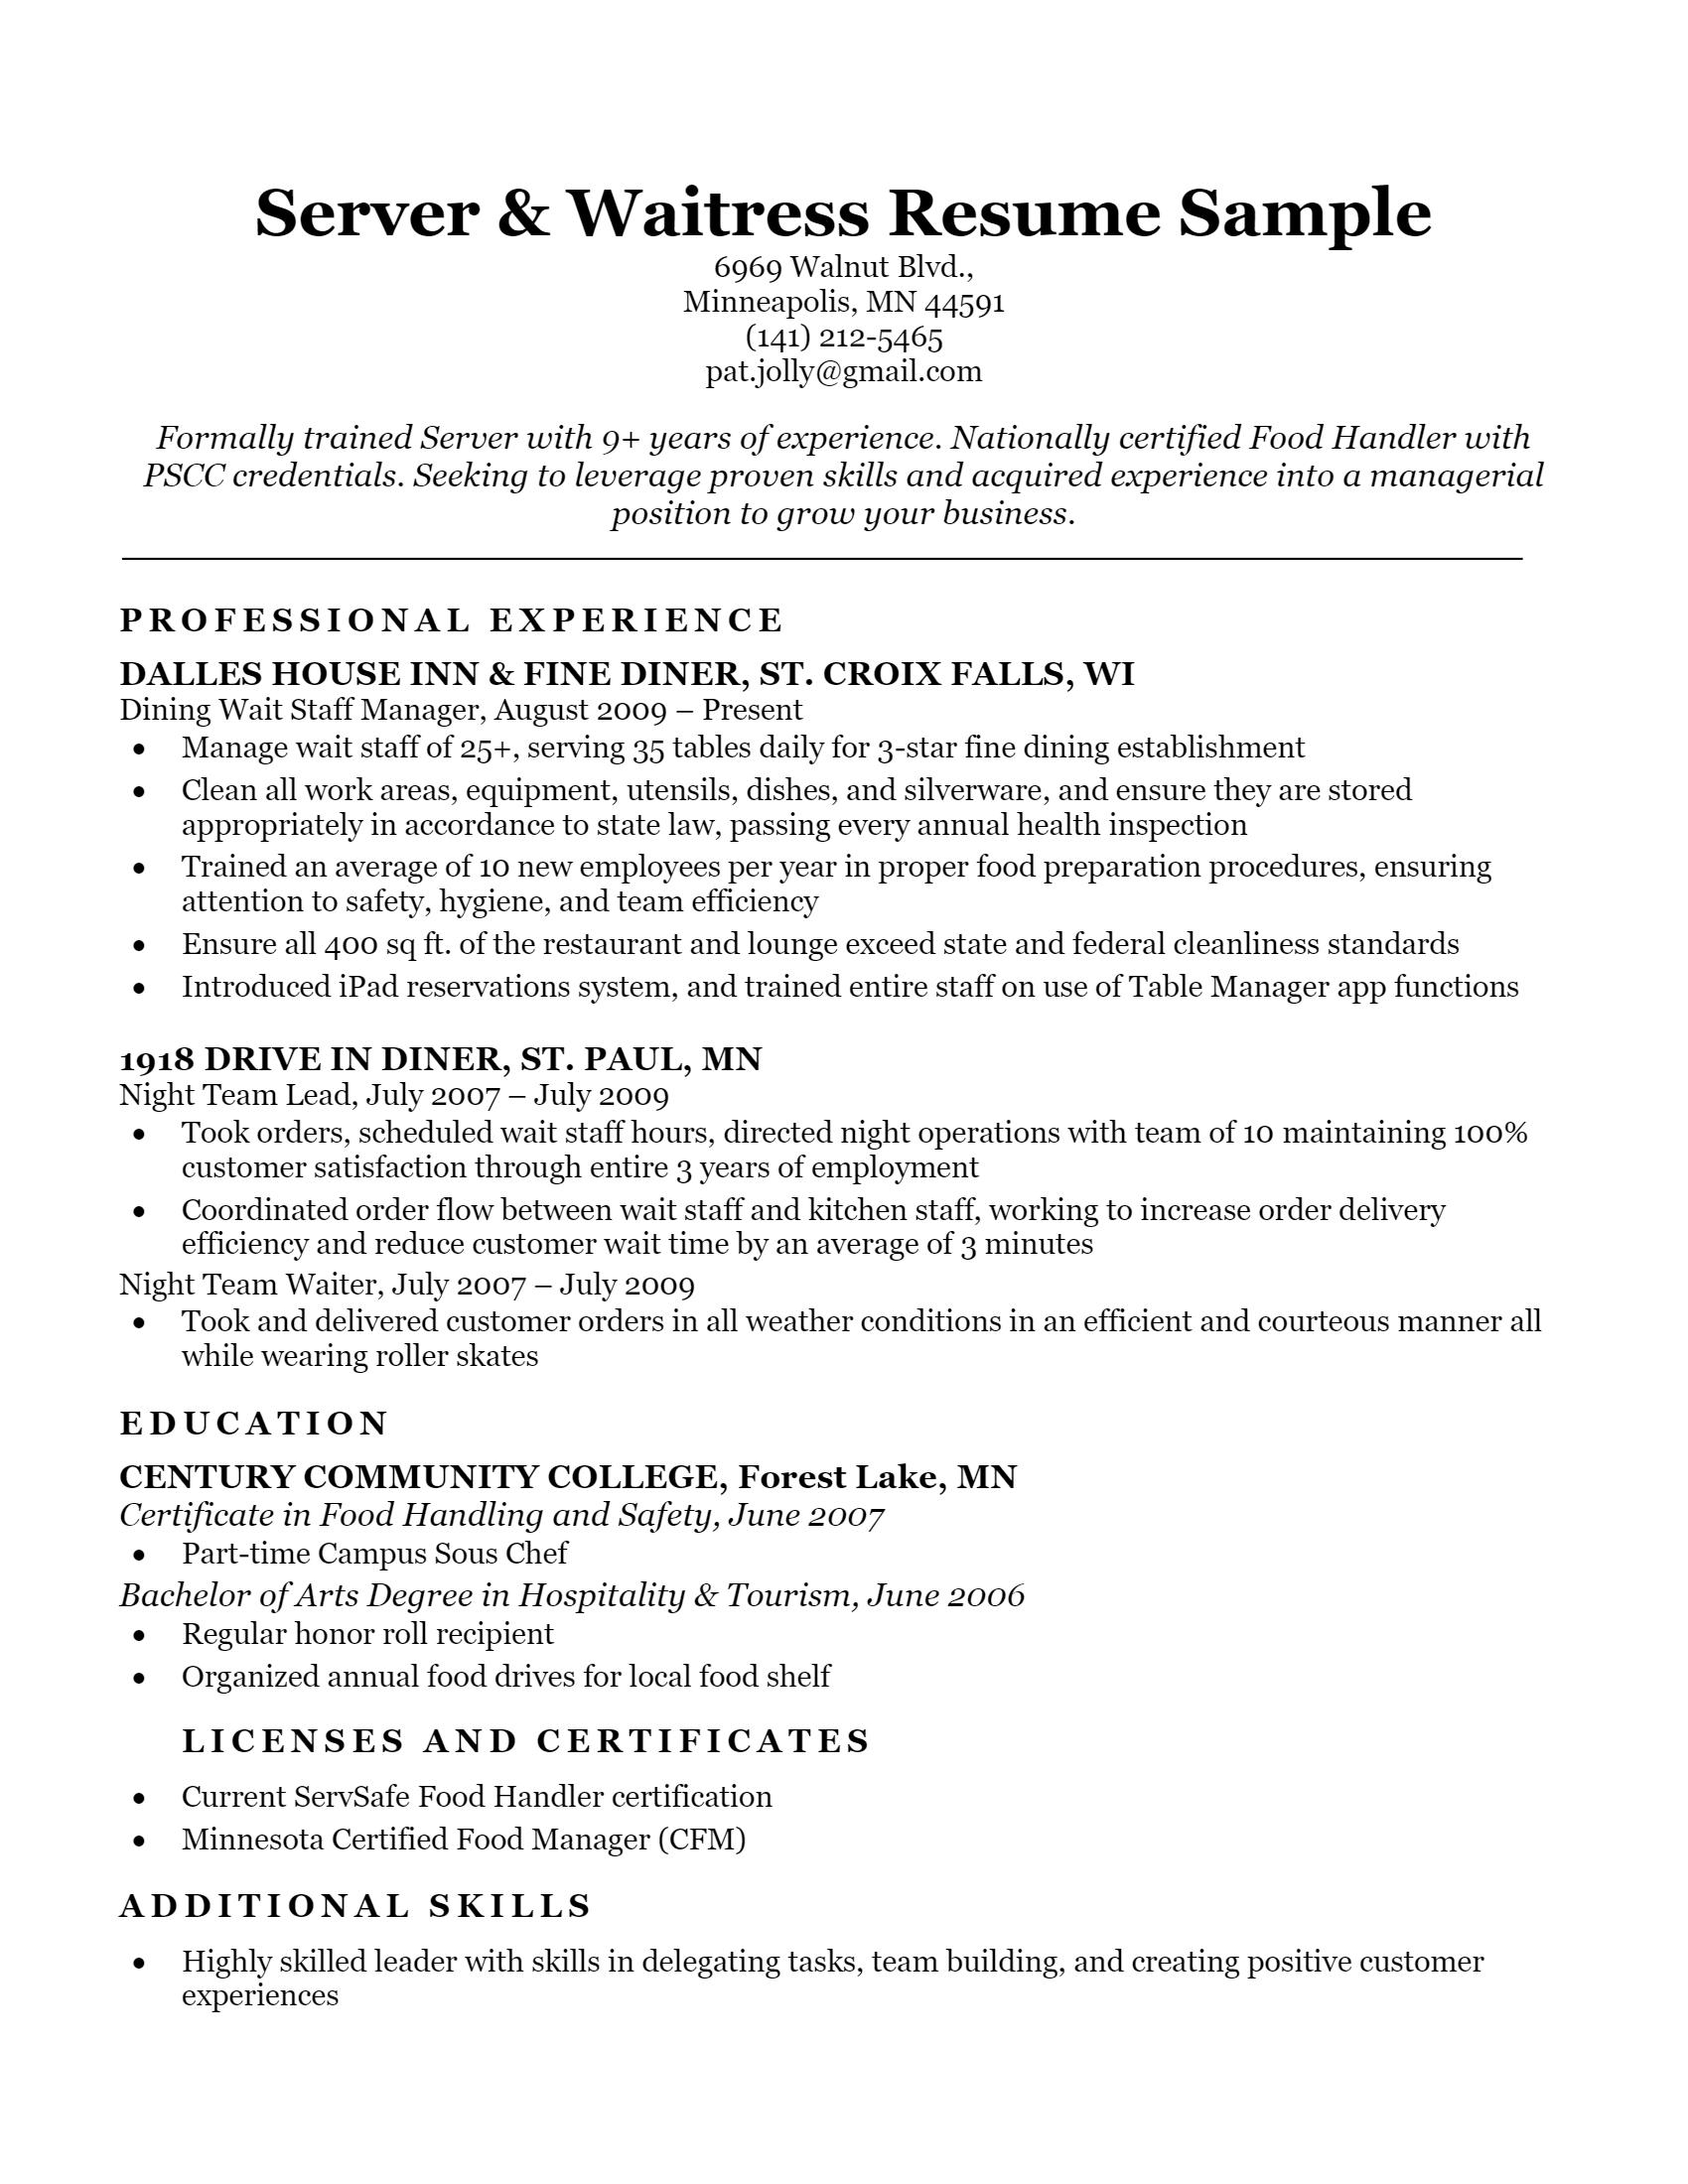 Server Resume > Server Resume .Docx (Word)